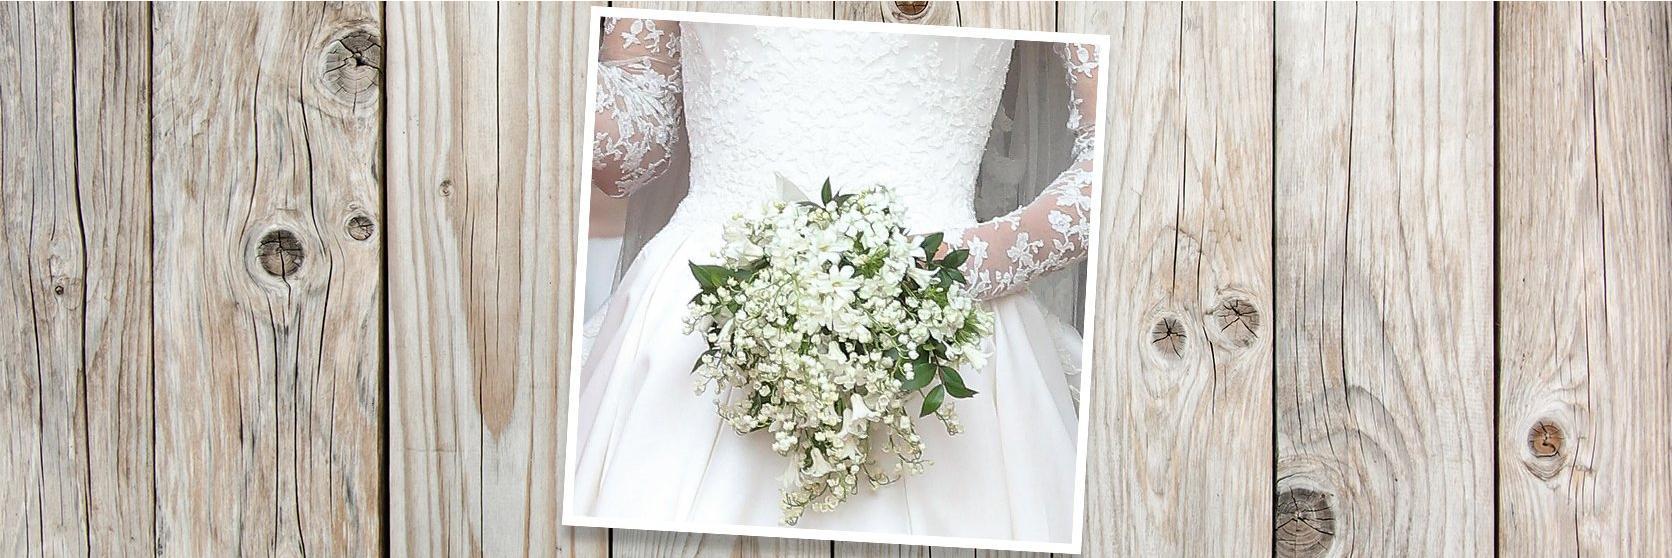 Kate-Middleton-Bouquet-PLANK